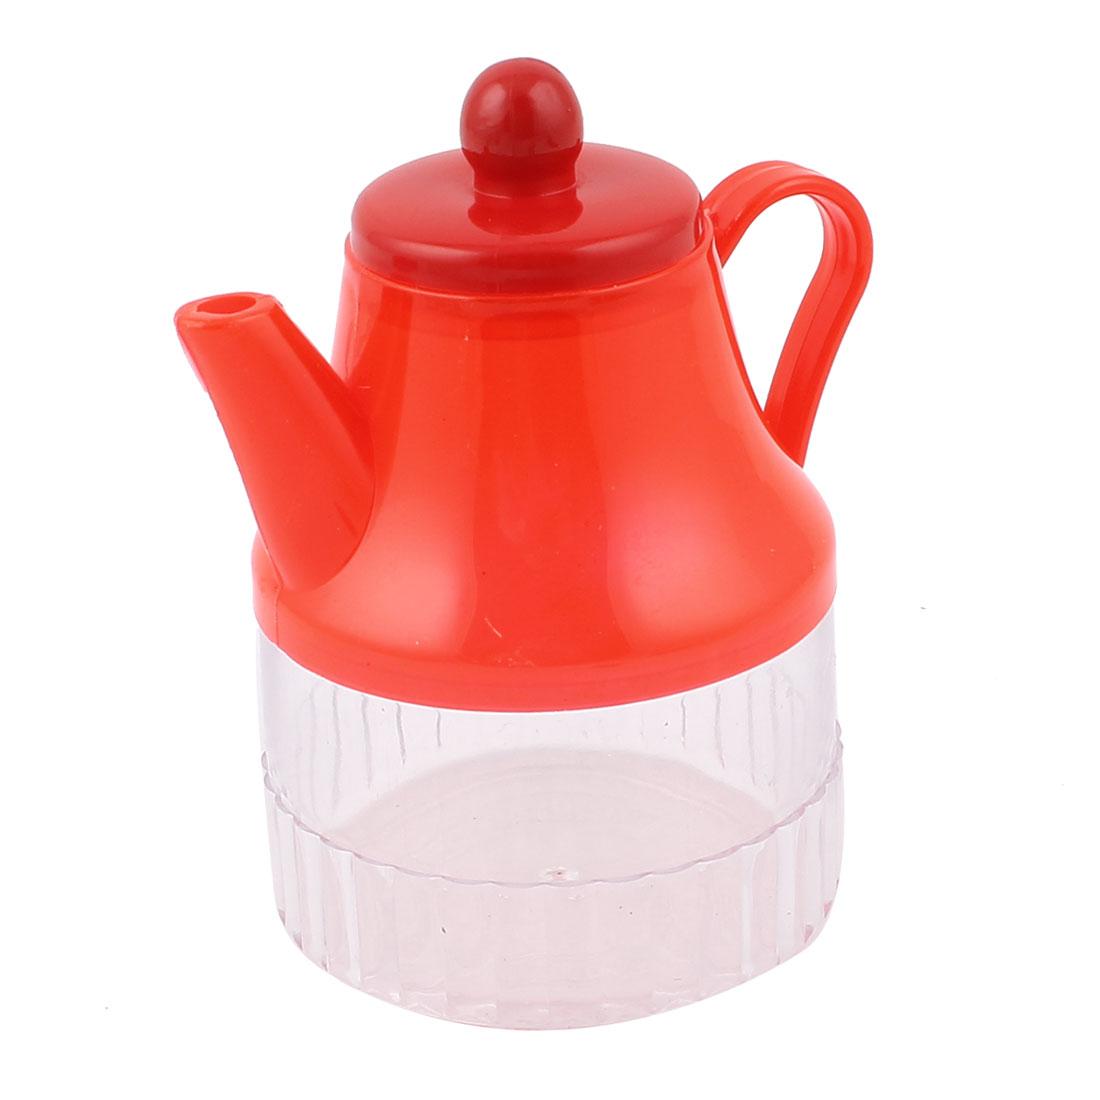 Kitchenware Red Clear Plastic Oil Flavoring Cruet Bottle Holder 300ml